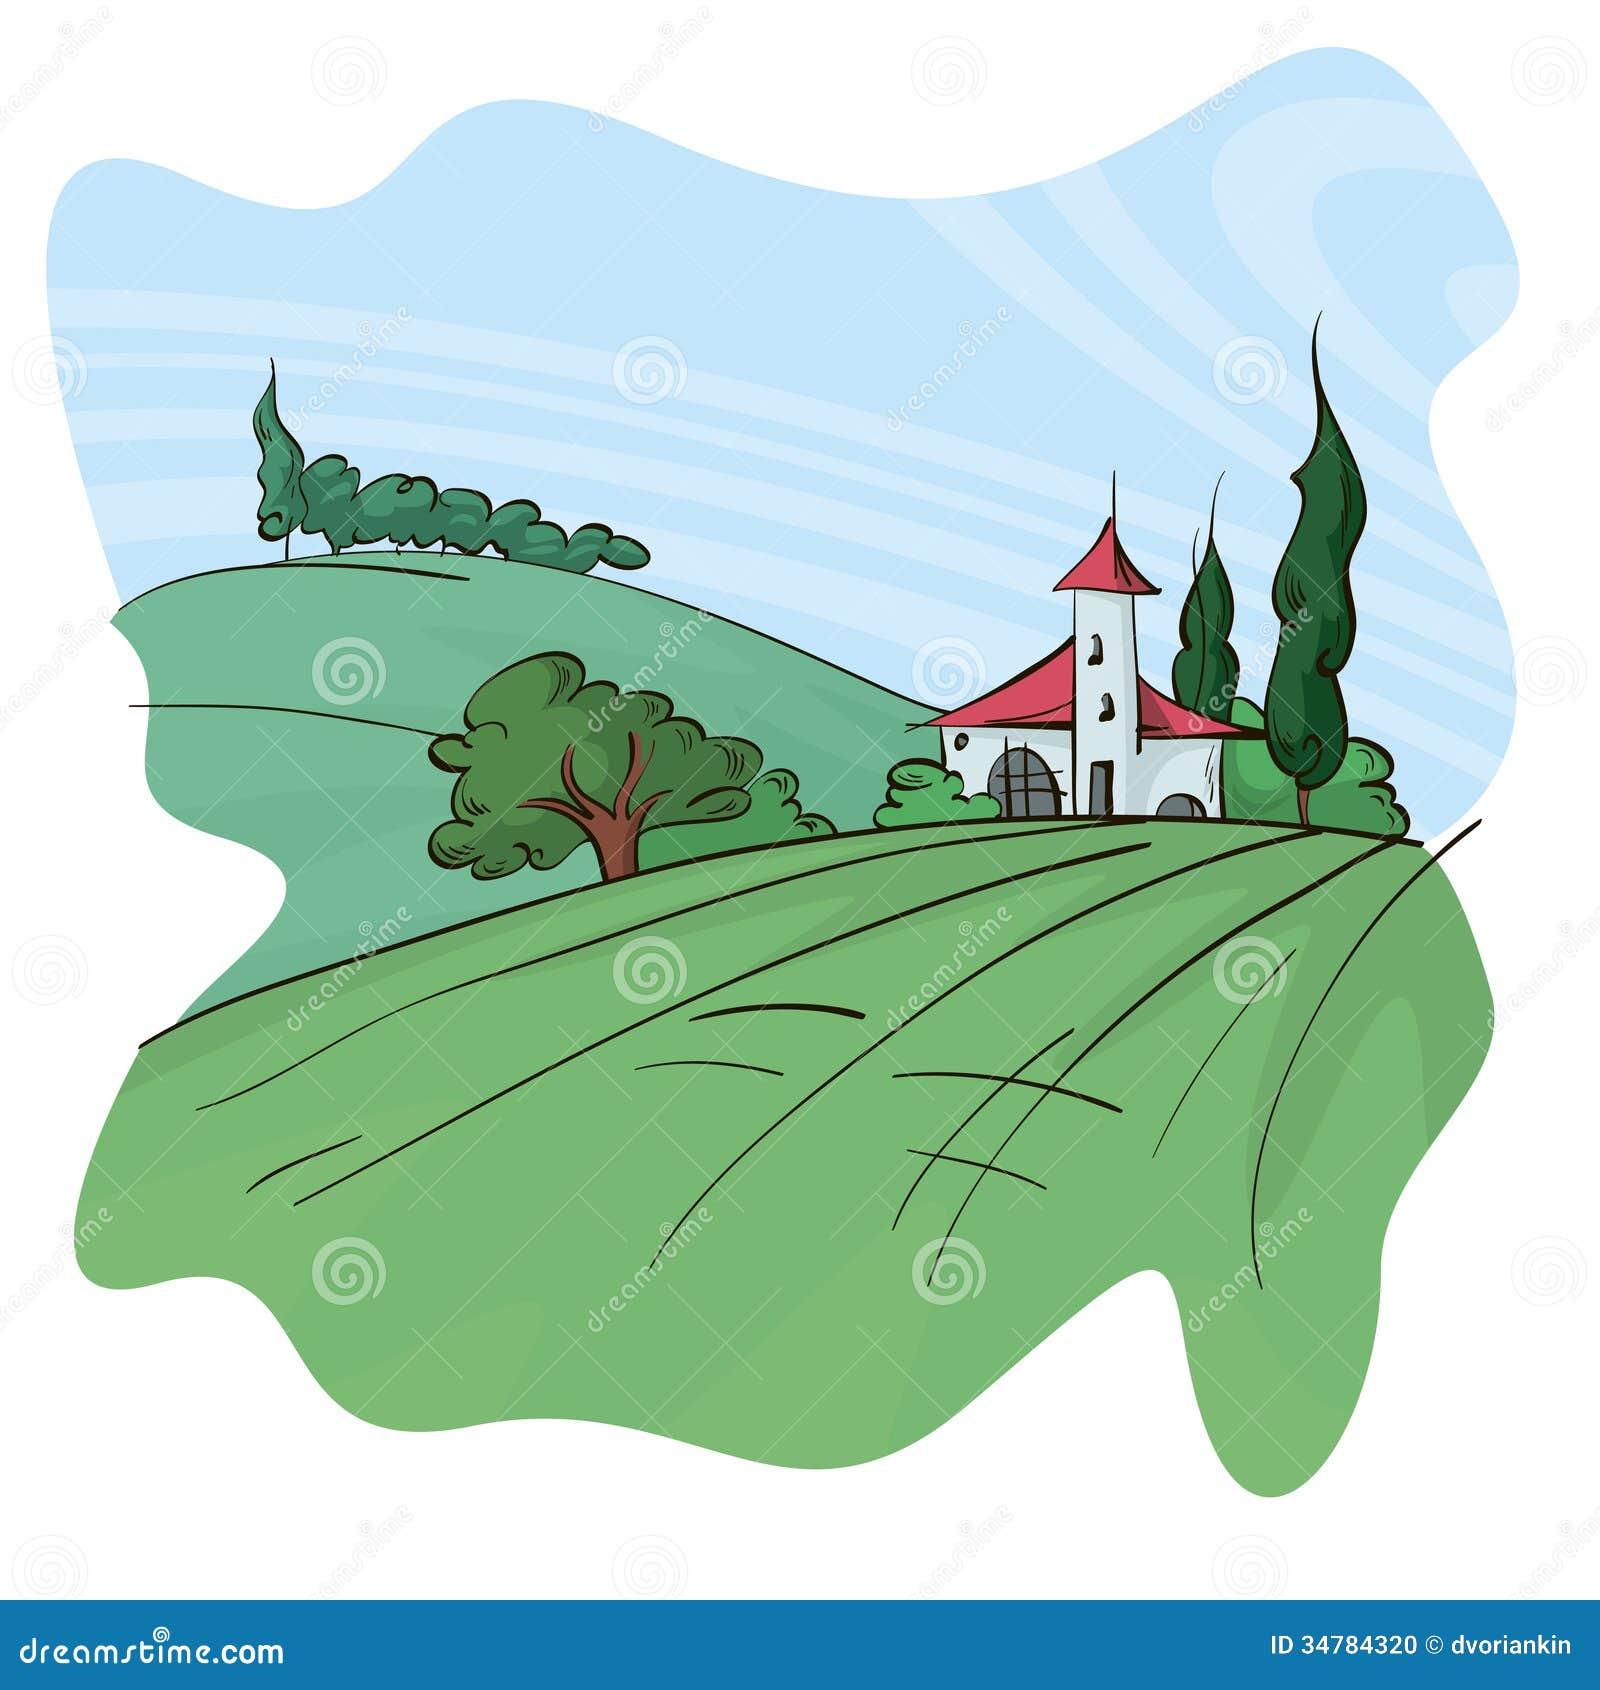 Cute Landscape Stock Photo Image 34784320